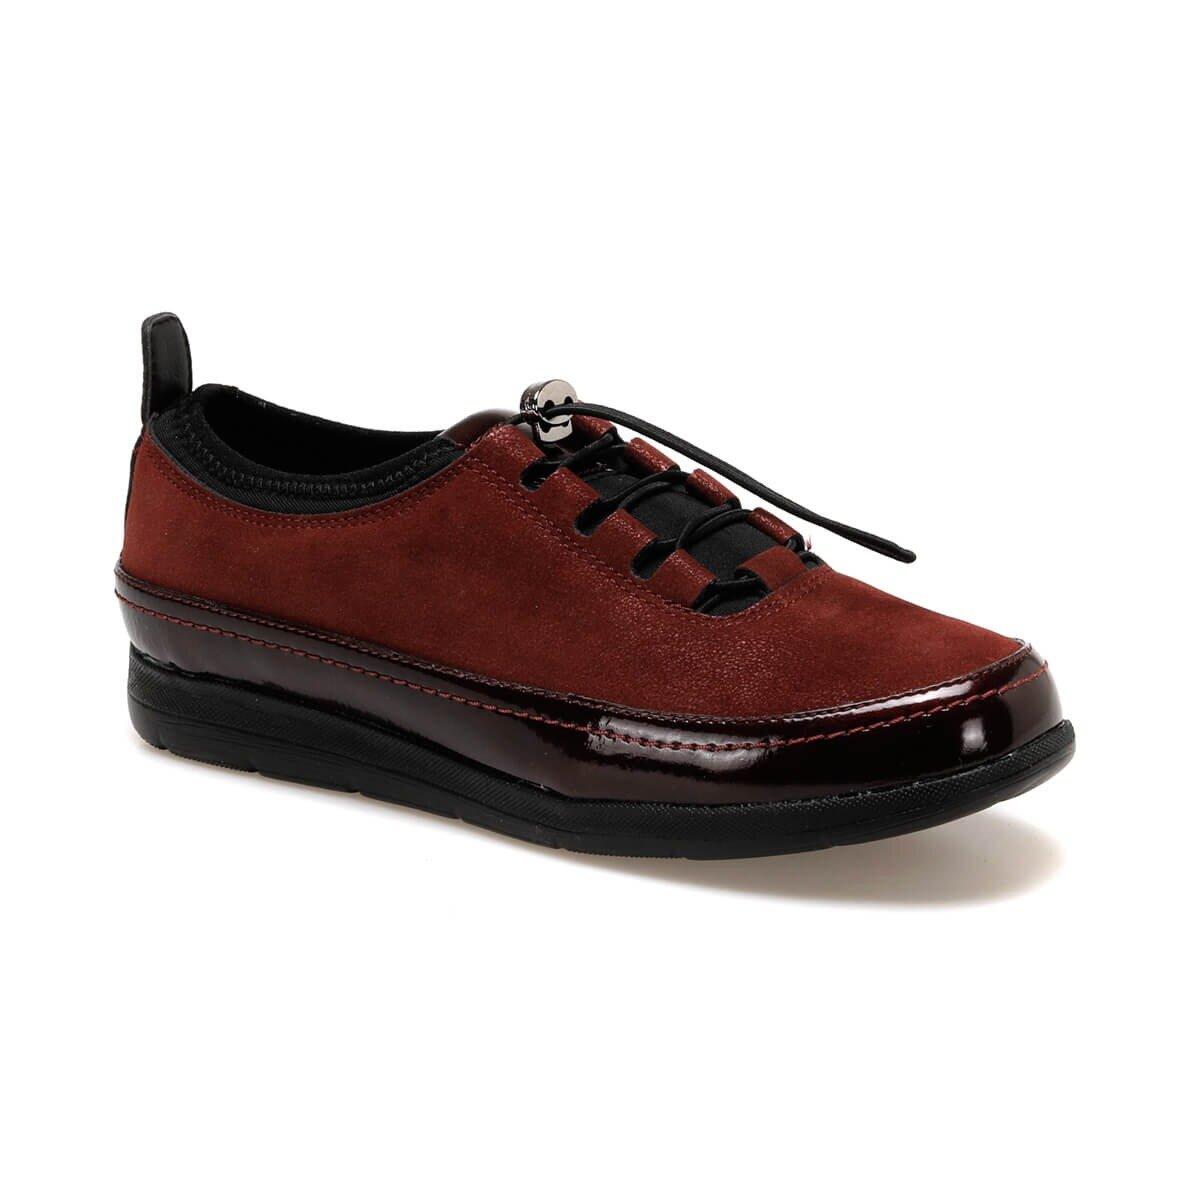 FLO 92.101001SZ Burgundy Women 'S Sneaker Shoes Polaris 5 Point